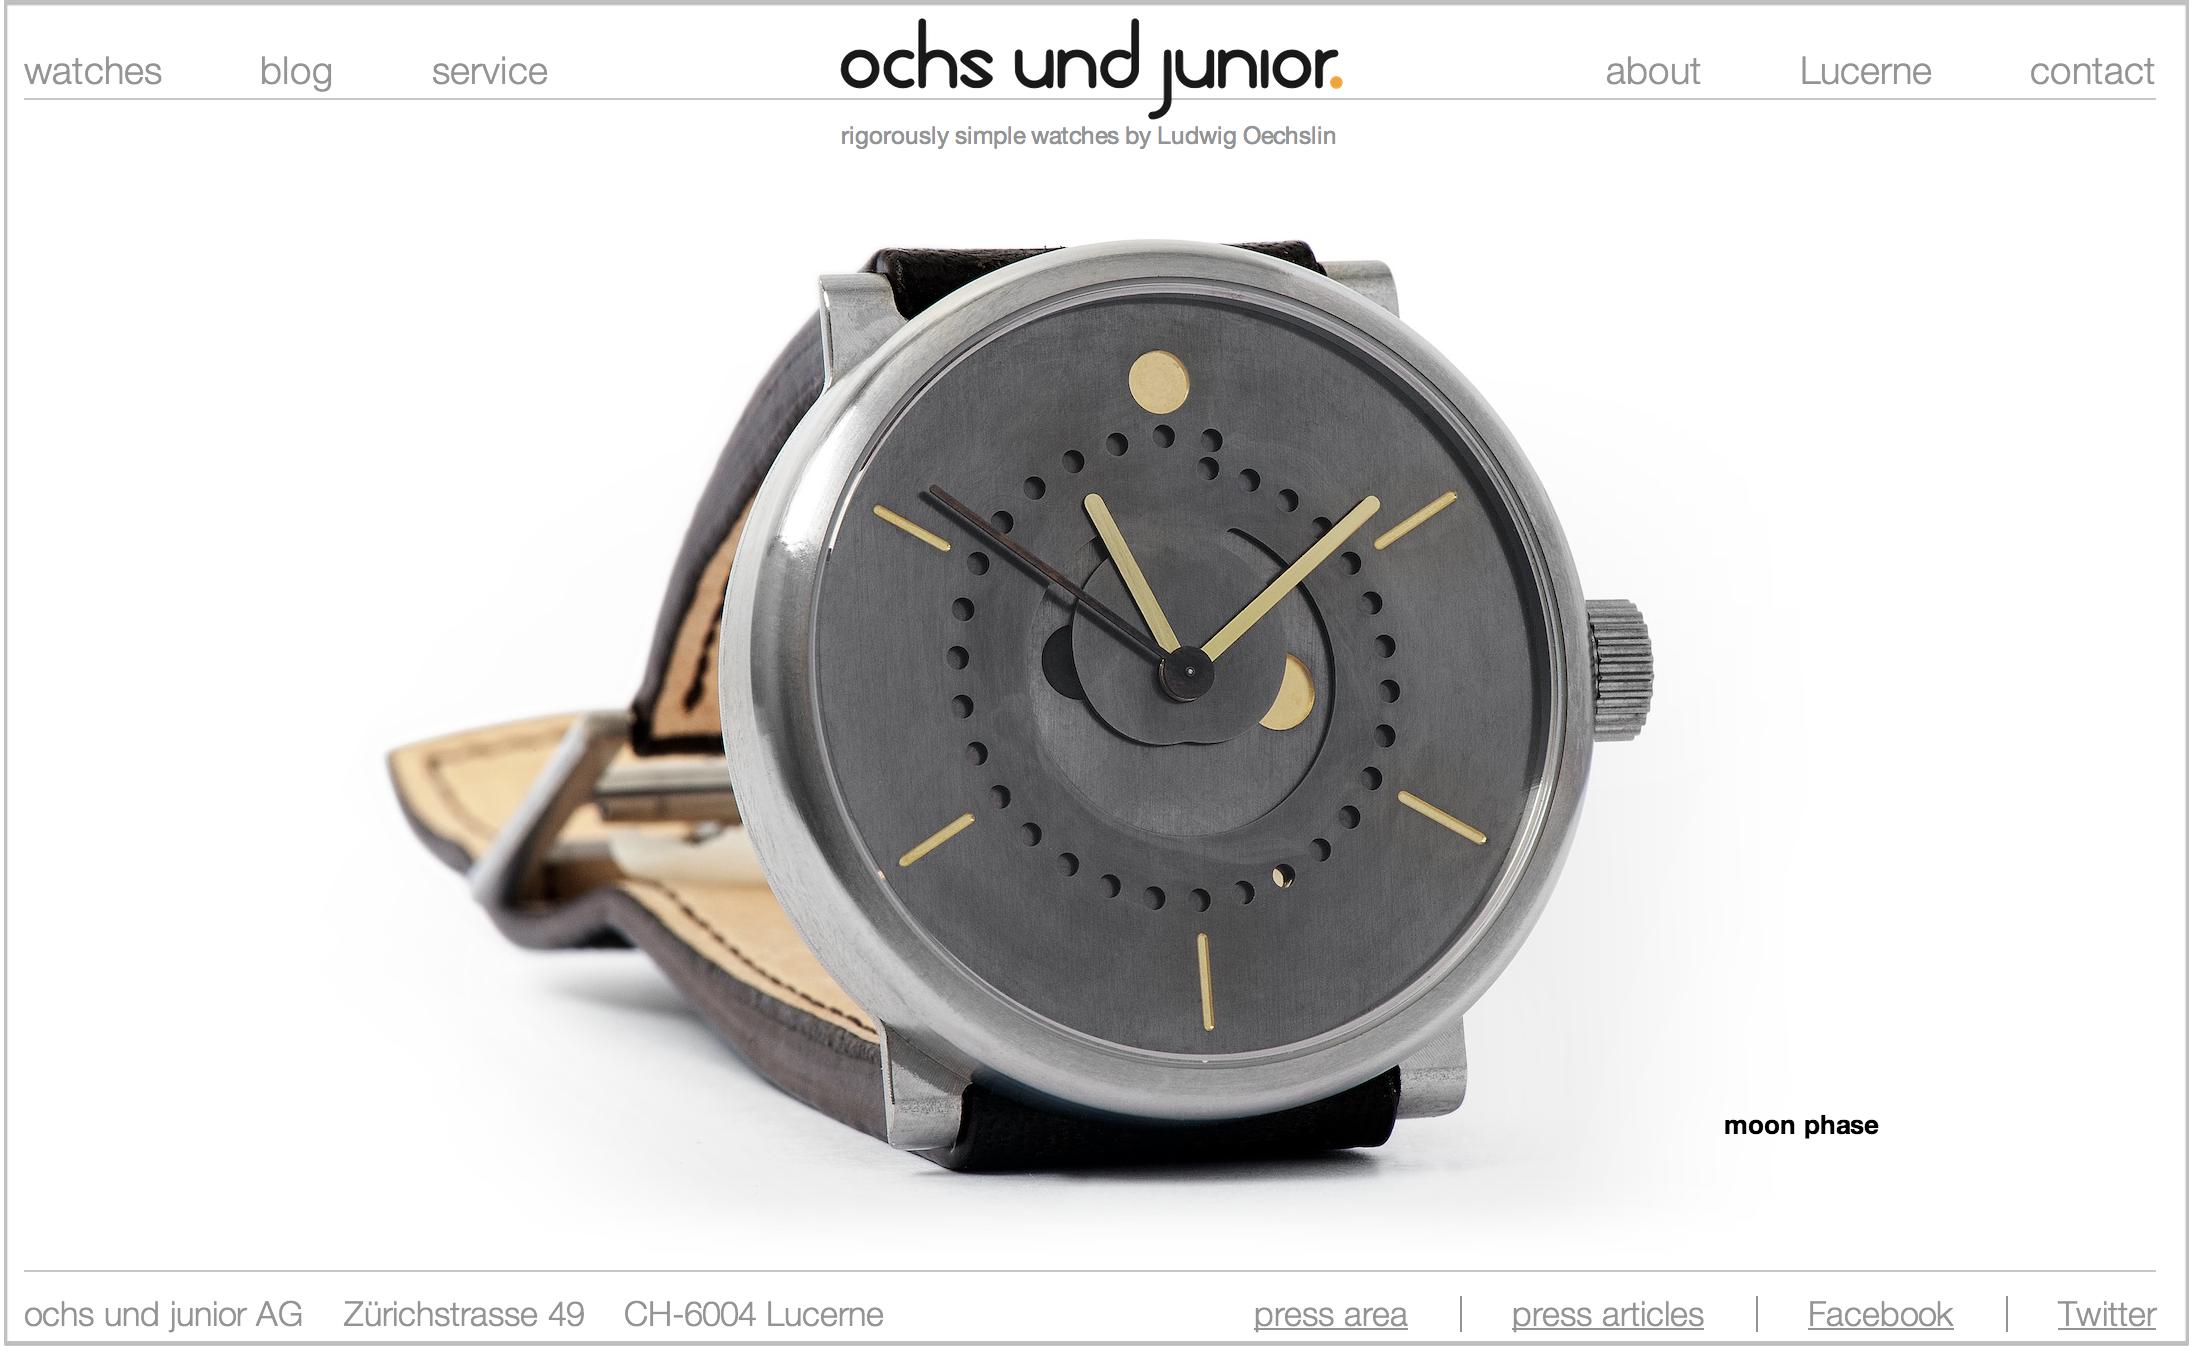 ox homepage 2